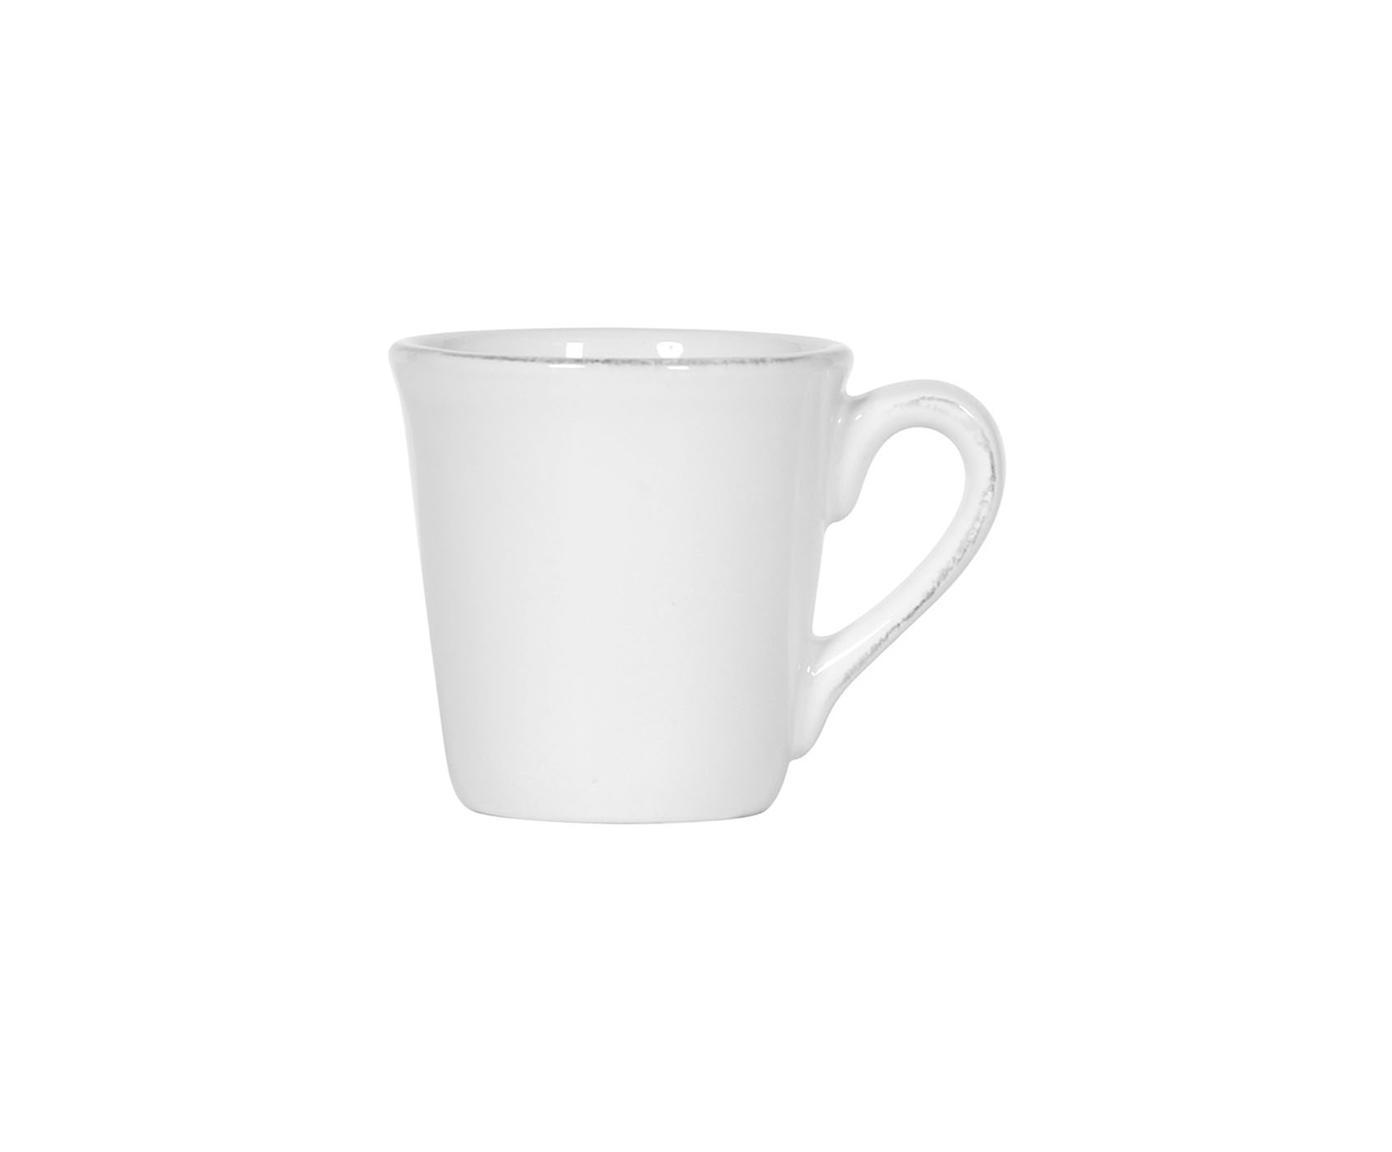 Tazas de café Constance, 2uds., Cerámica, Blanco, Ø 8 x Al 6 cm